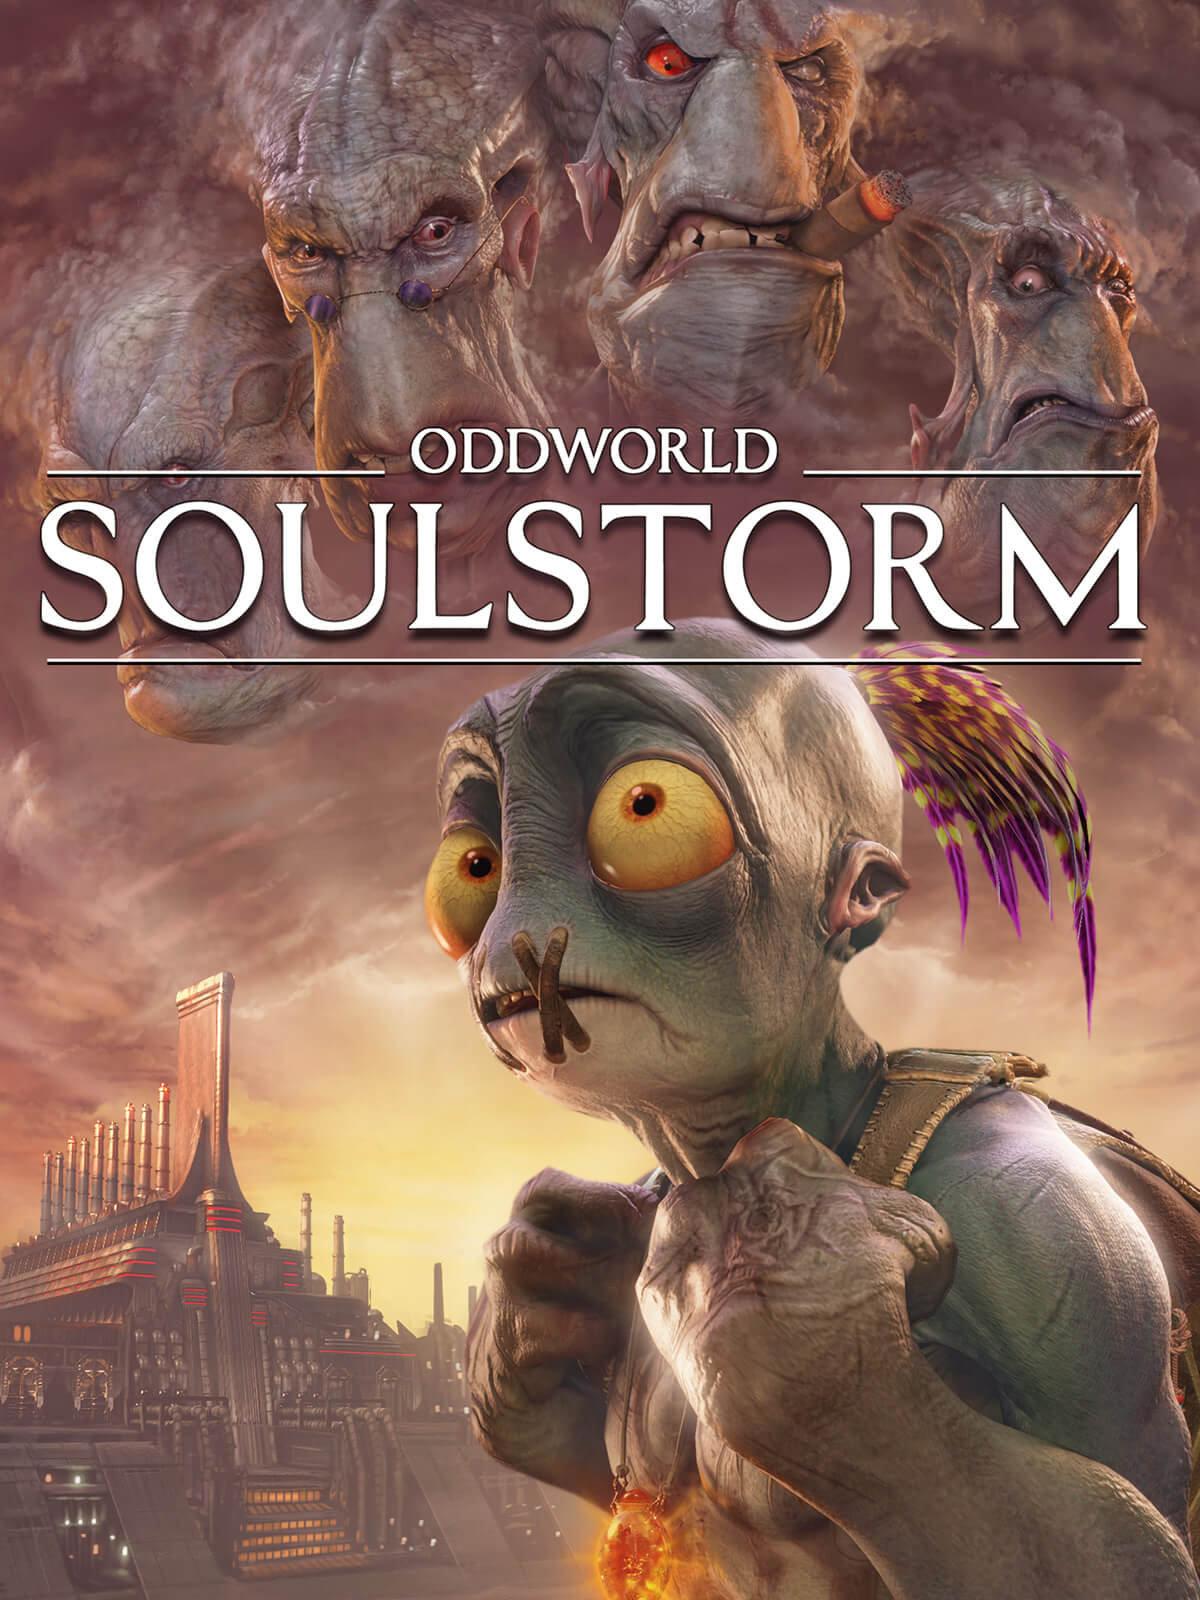 Poster for Oddworld: Soulstorm